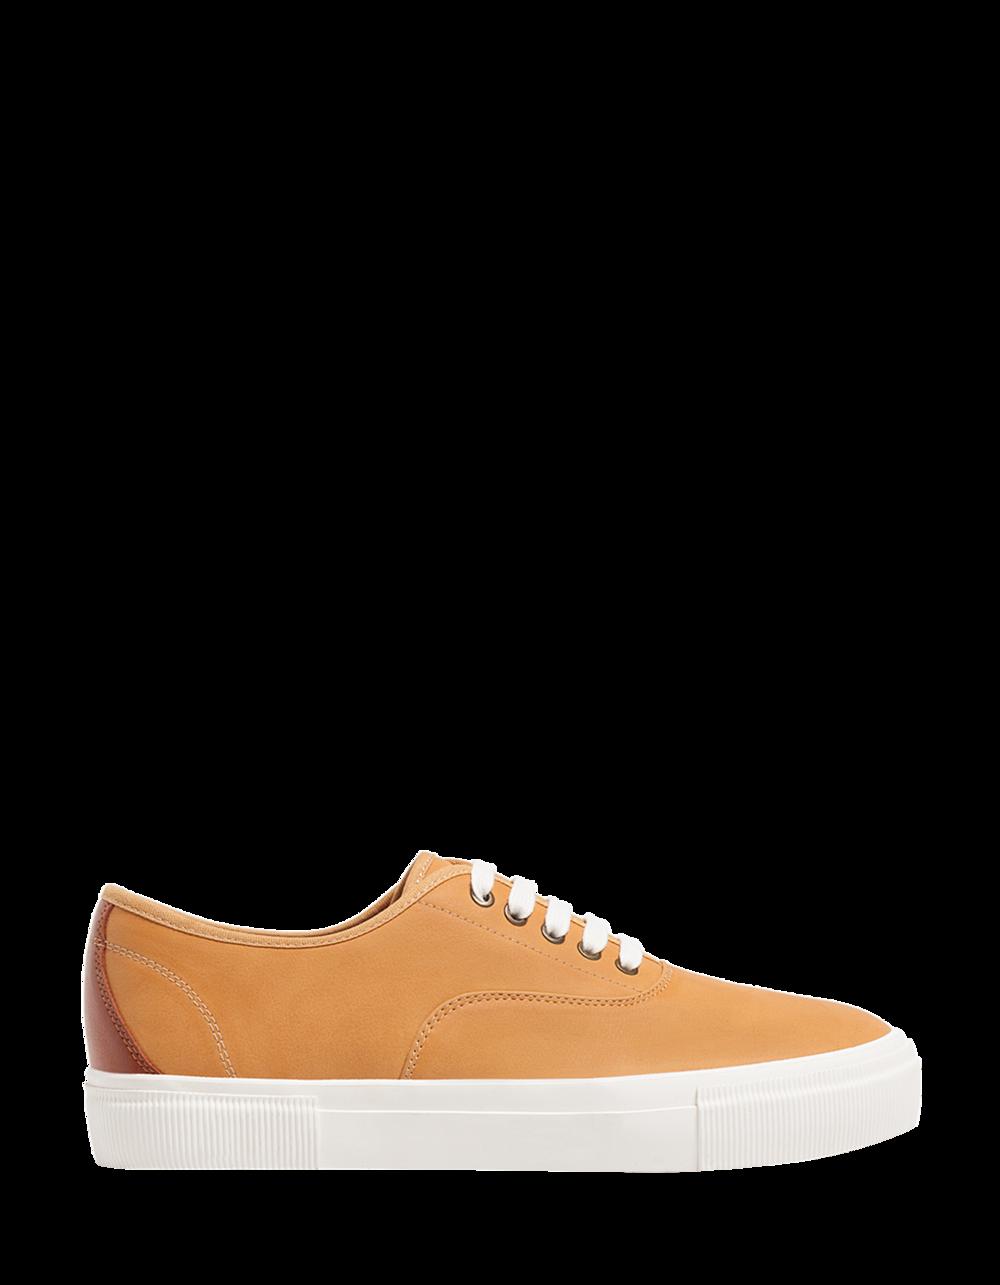 StradivariusMan_shoes (9).png